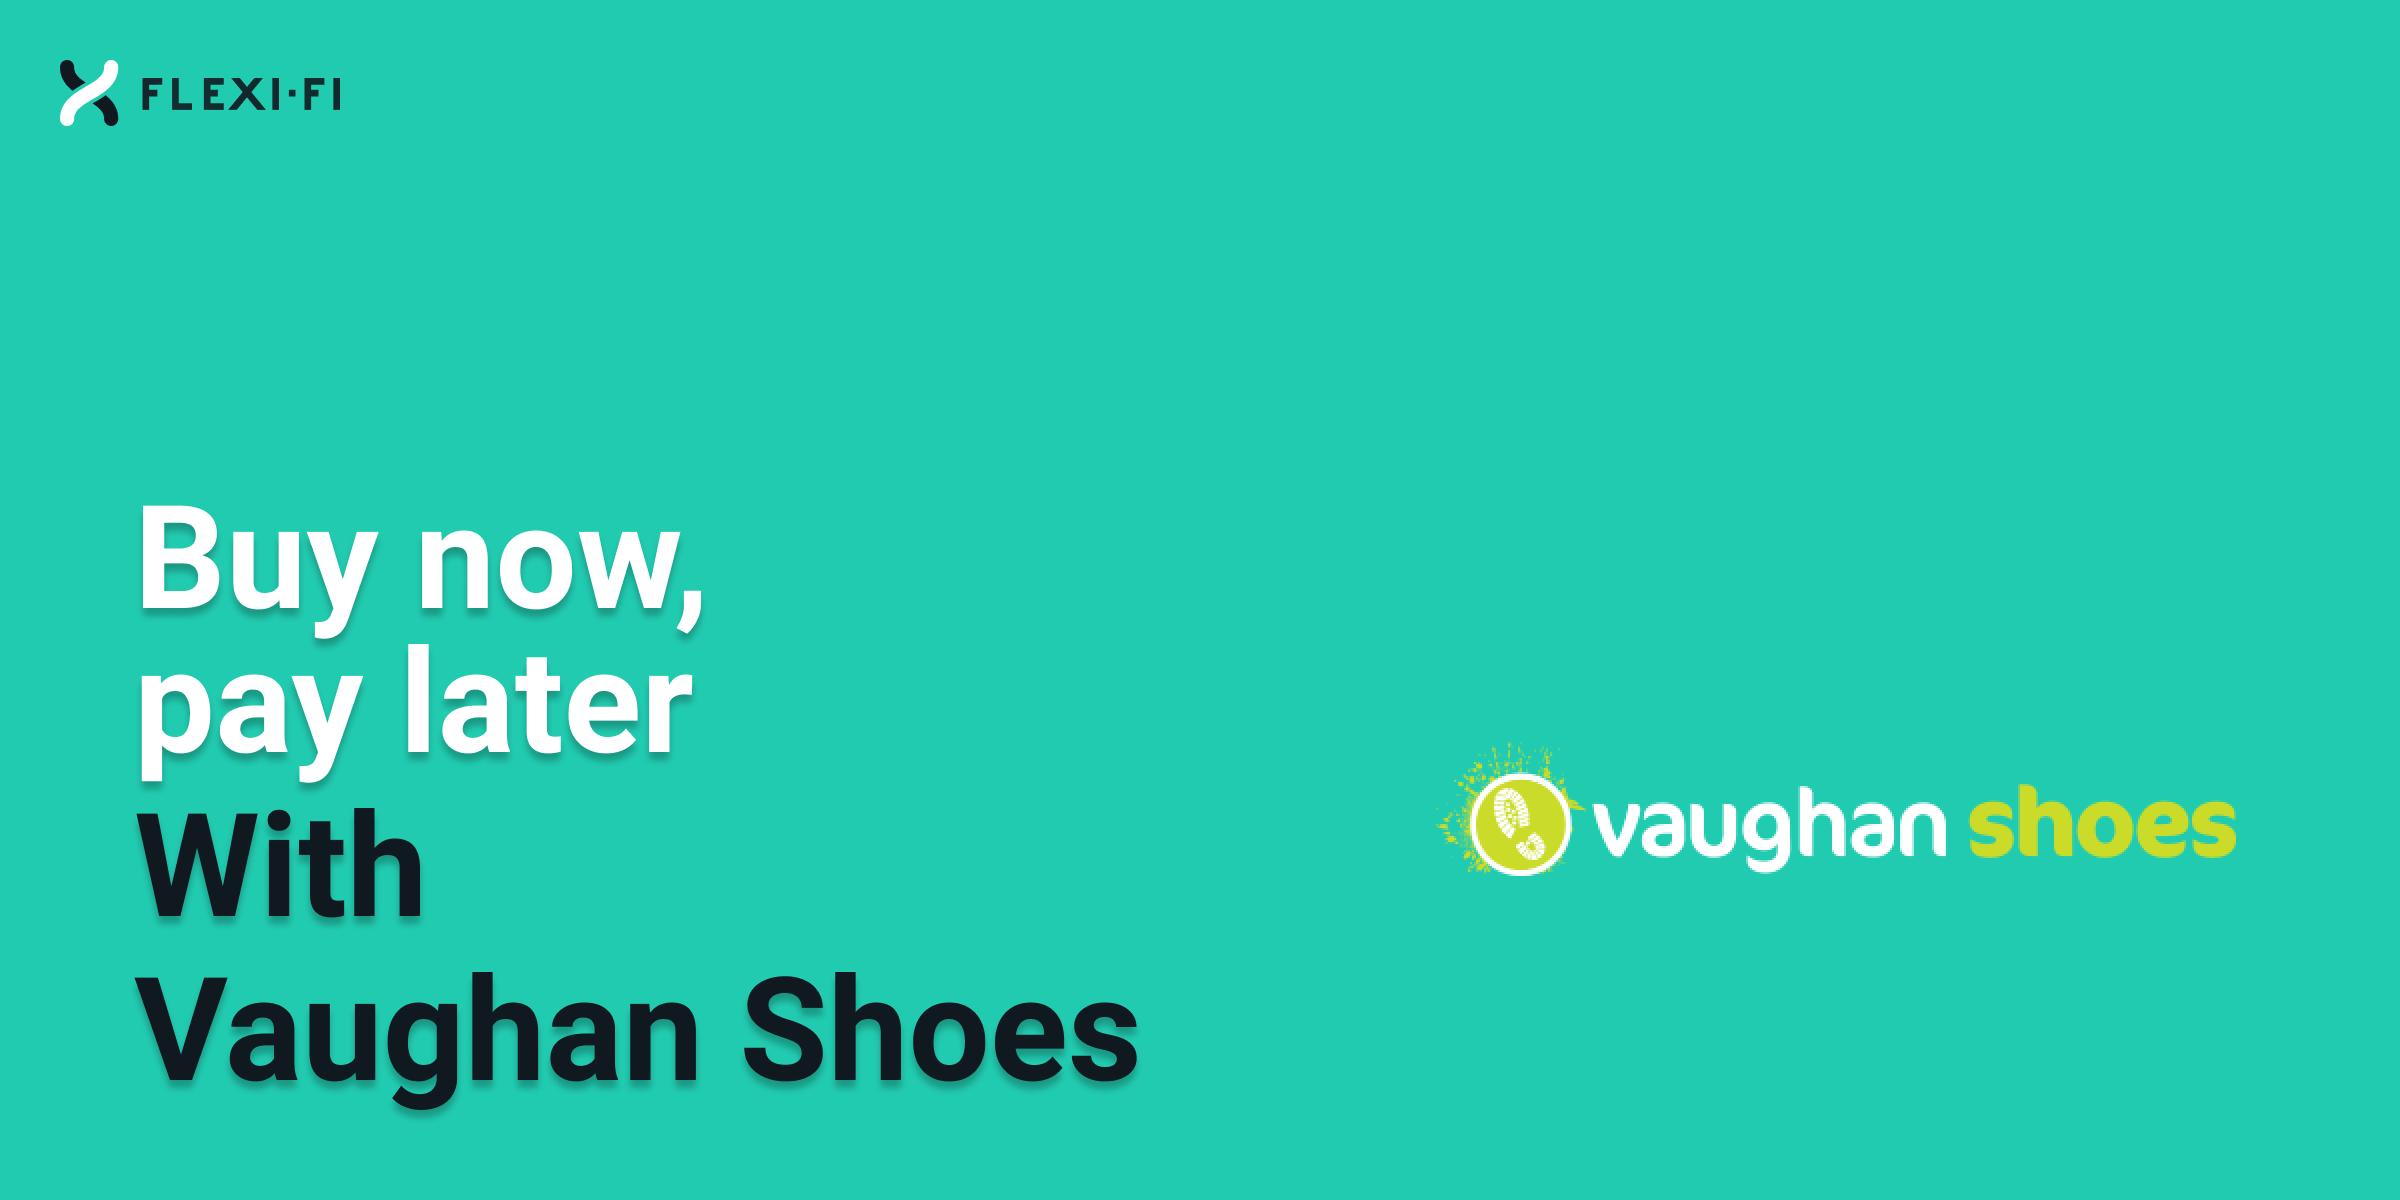 Retailer Vaughan Shoes